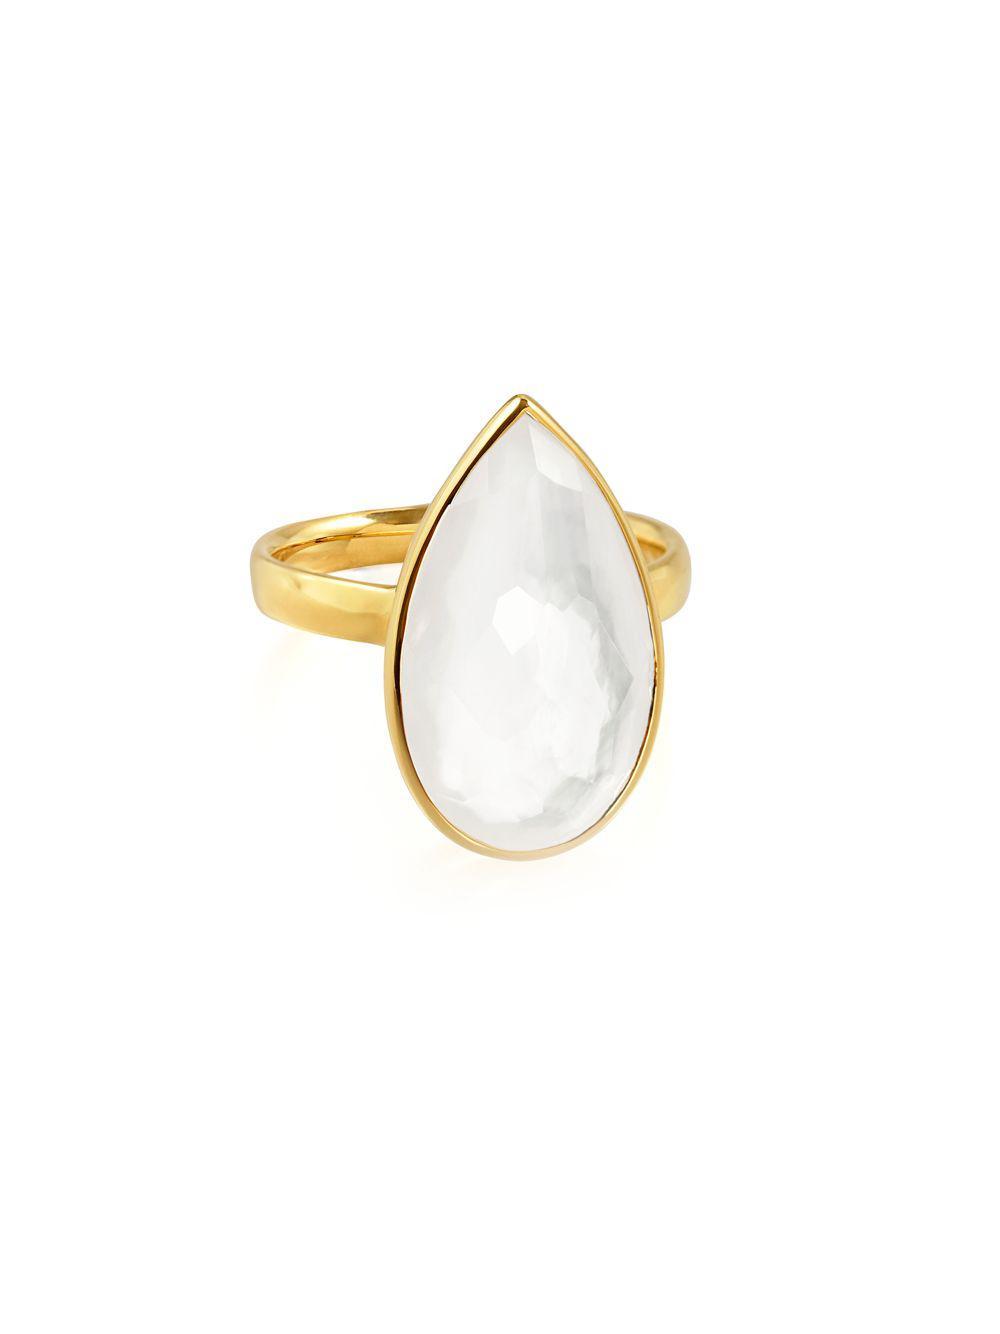 Ippolita 18k Rock Candy Single Medium Teardrop Ring in Citrine/Agate, Size 7